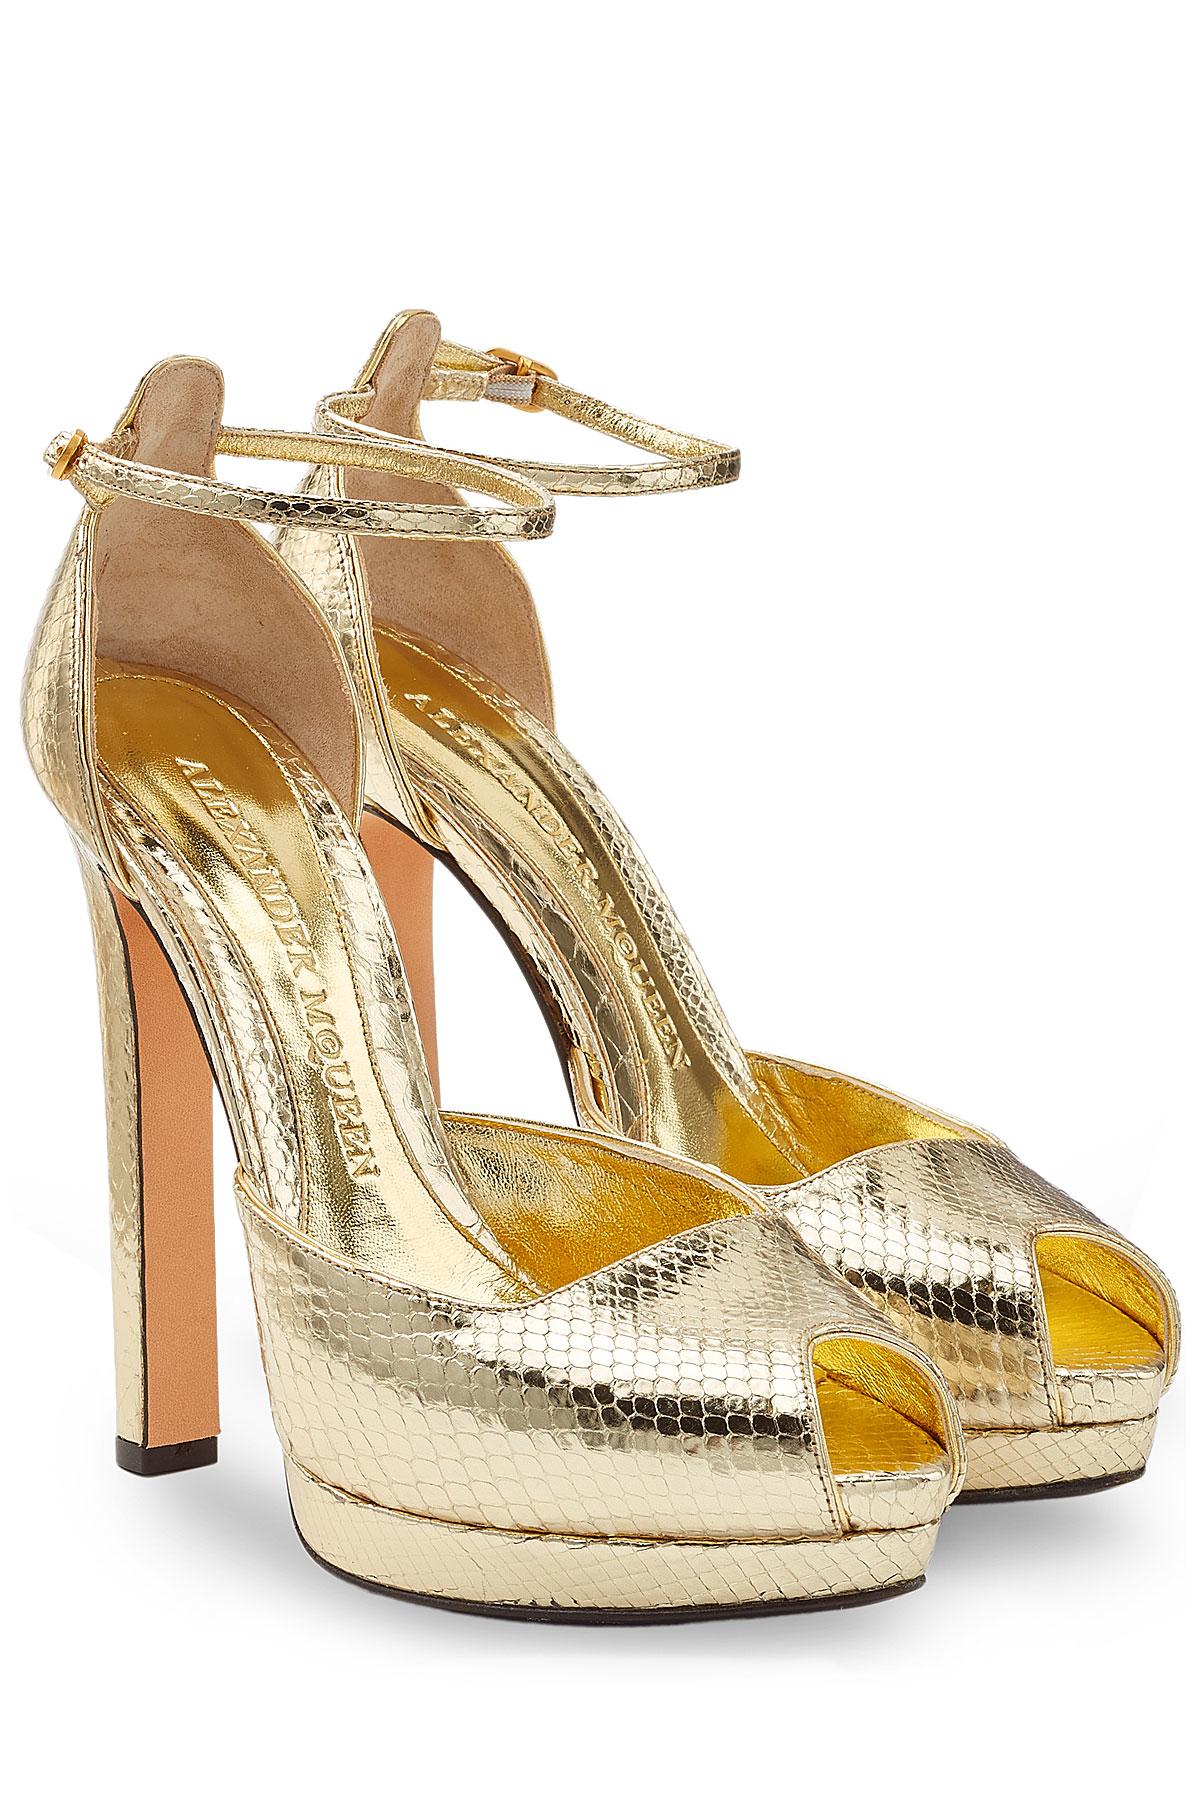 Lyst Alexander Mcqueen Metallic Leather Platform Sandals